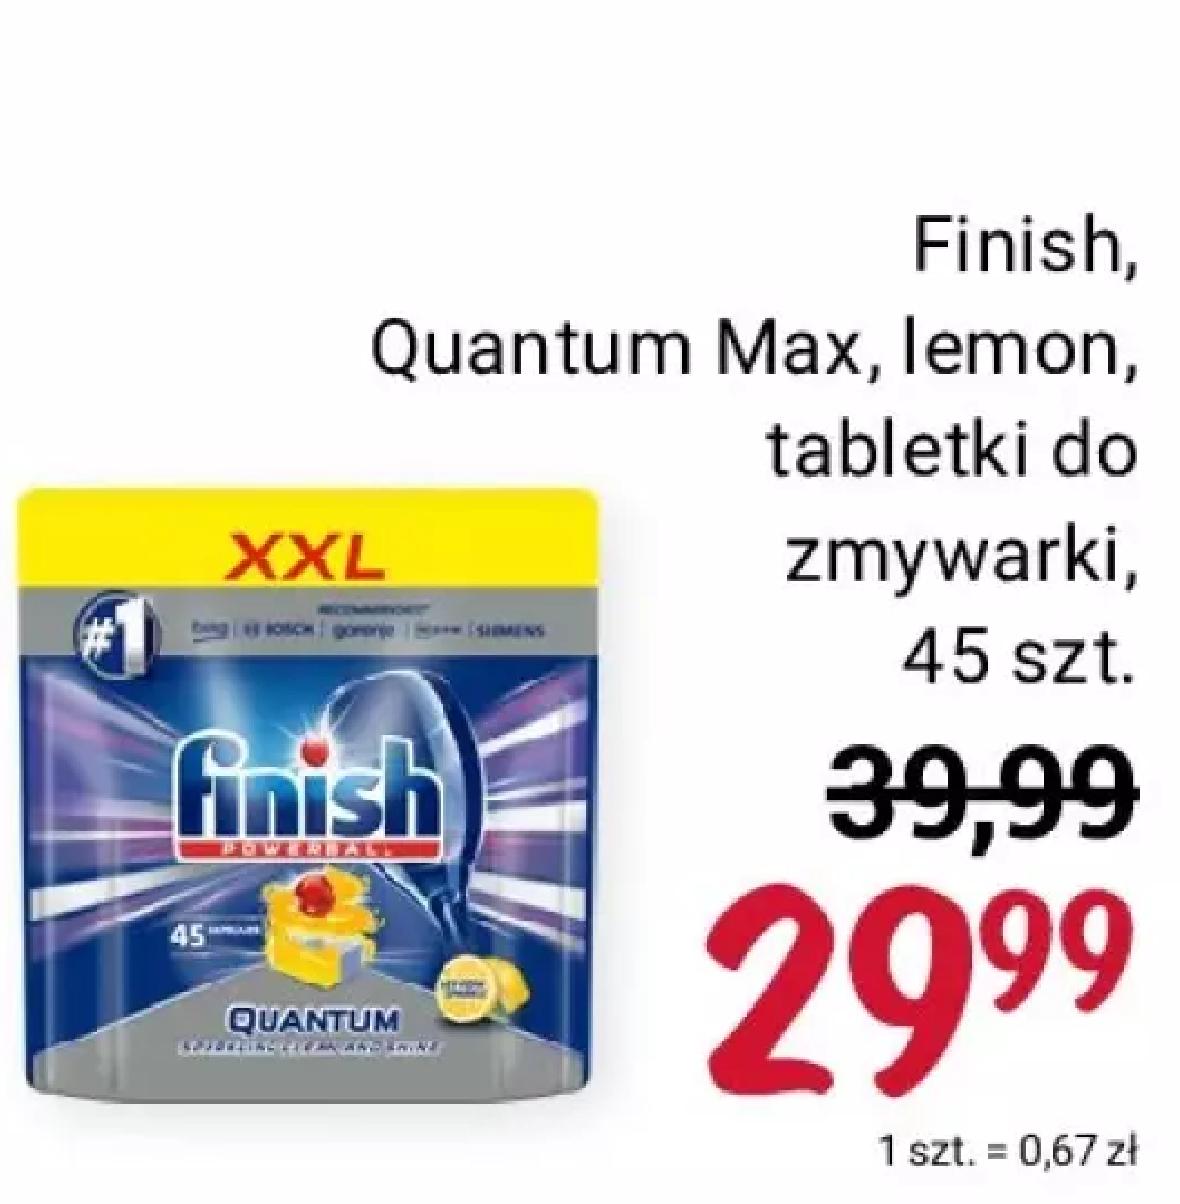 Tabletki do zmywarki Finish Quantum Max, 45 szt. | Rossmann